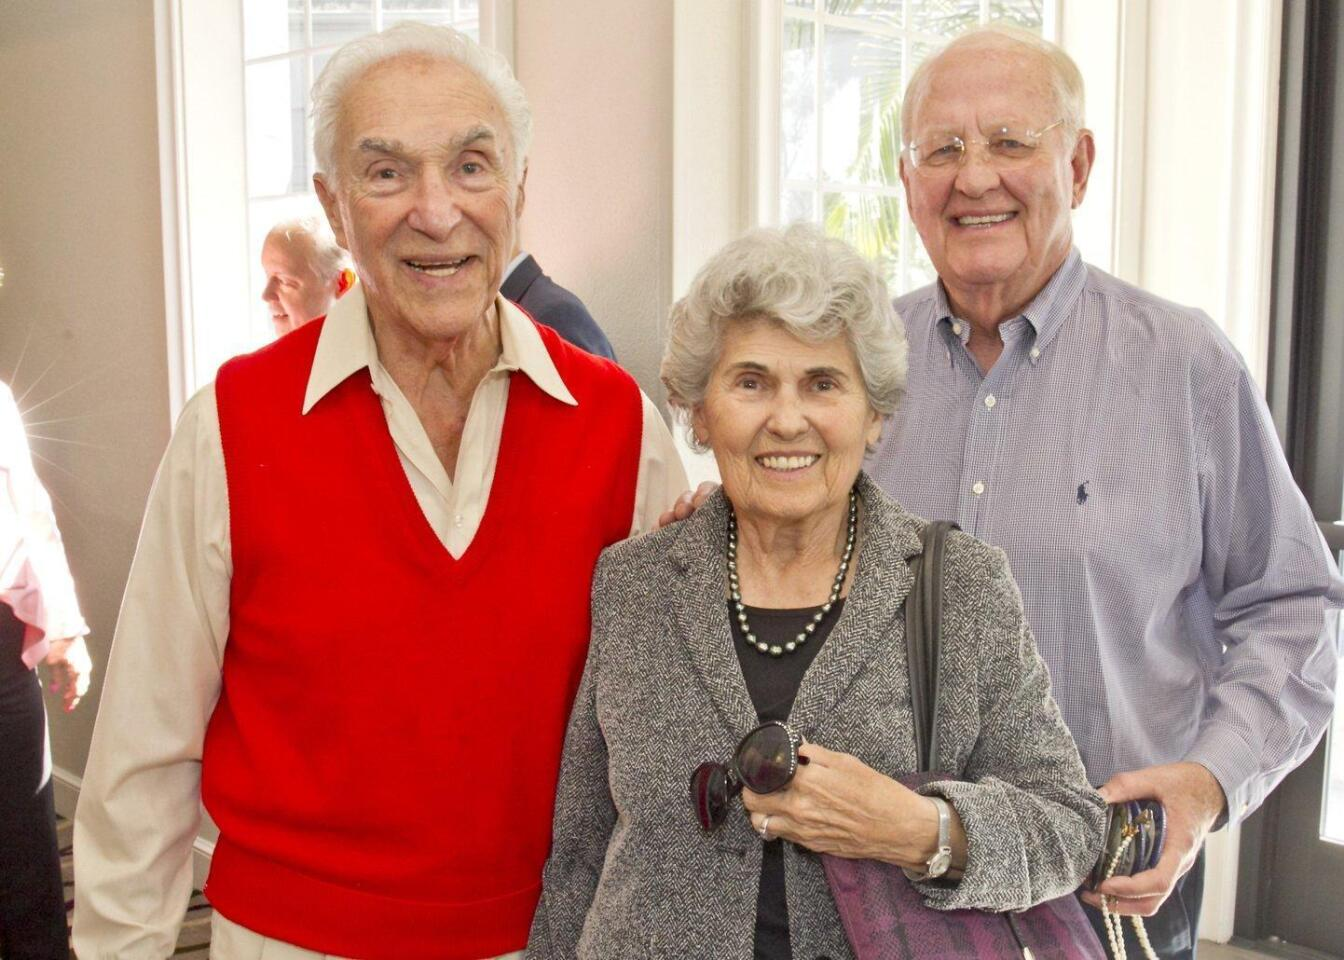 Jere and Joyce Oren, Karl Wagner